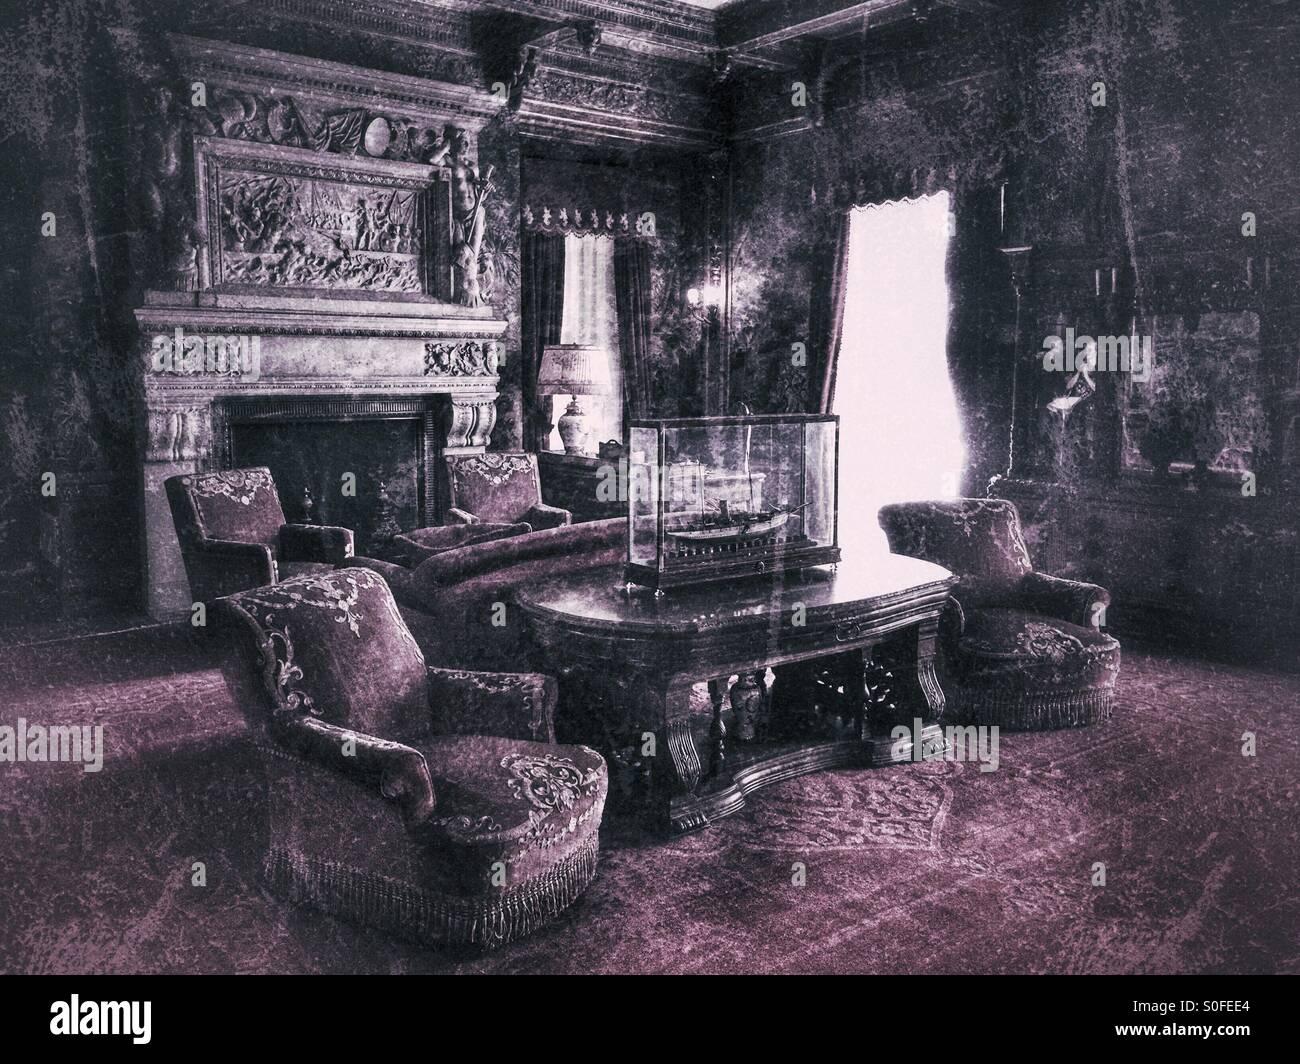 Fireplace 1800s Stock Photos & Fireplace 1800s Stock Images - Alamy